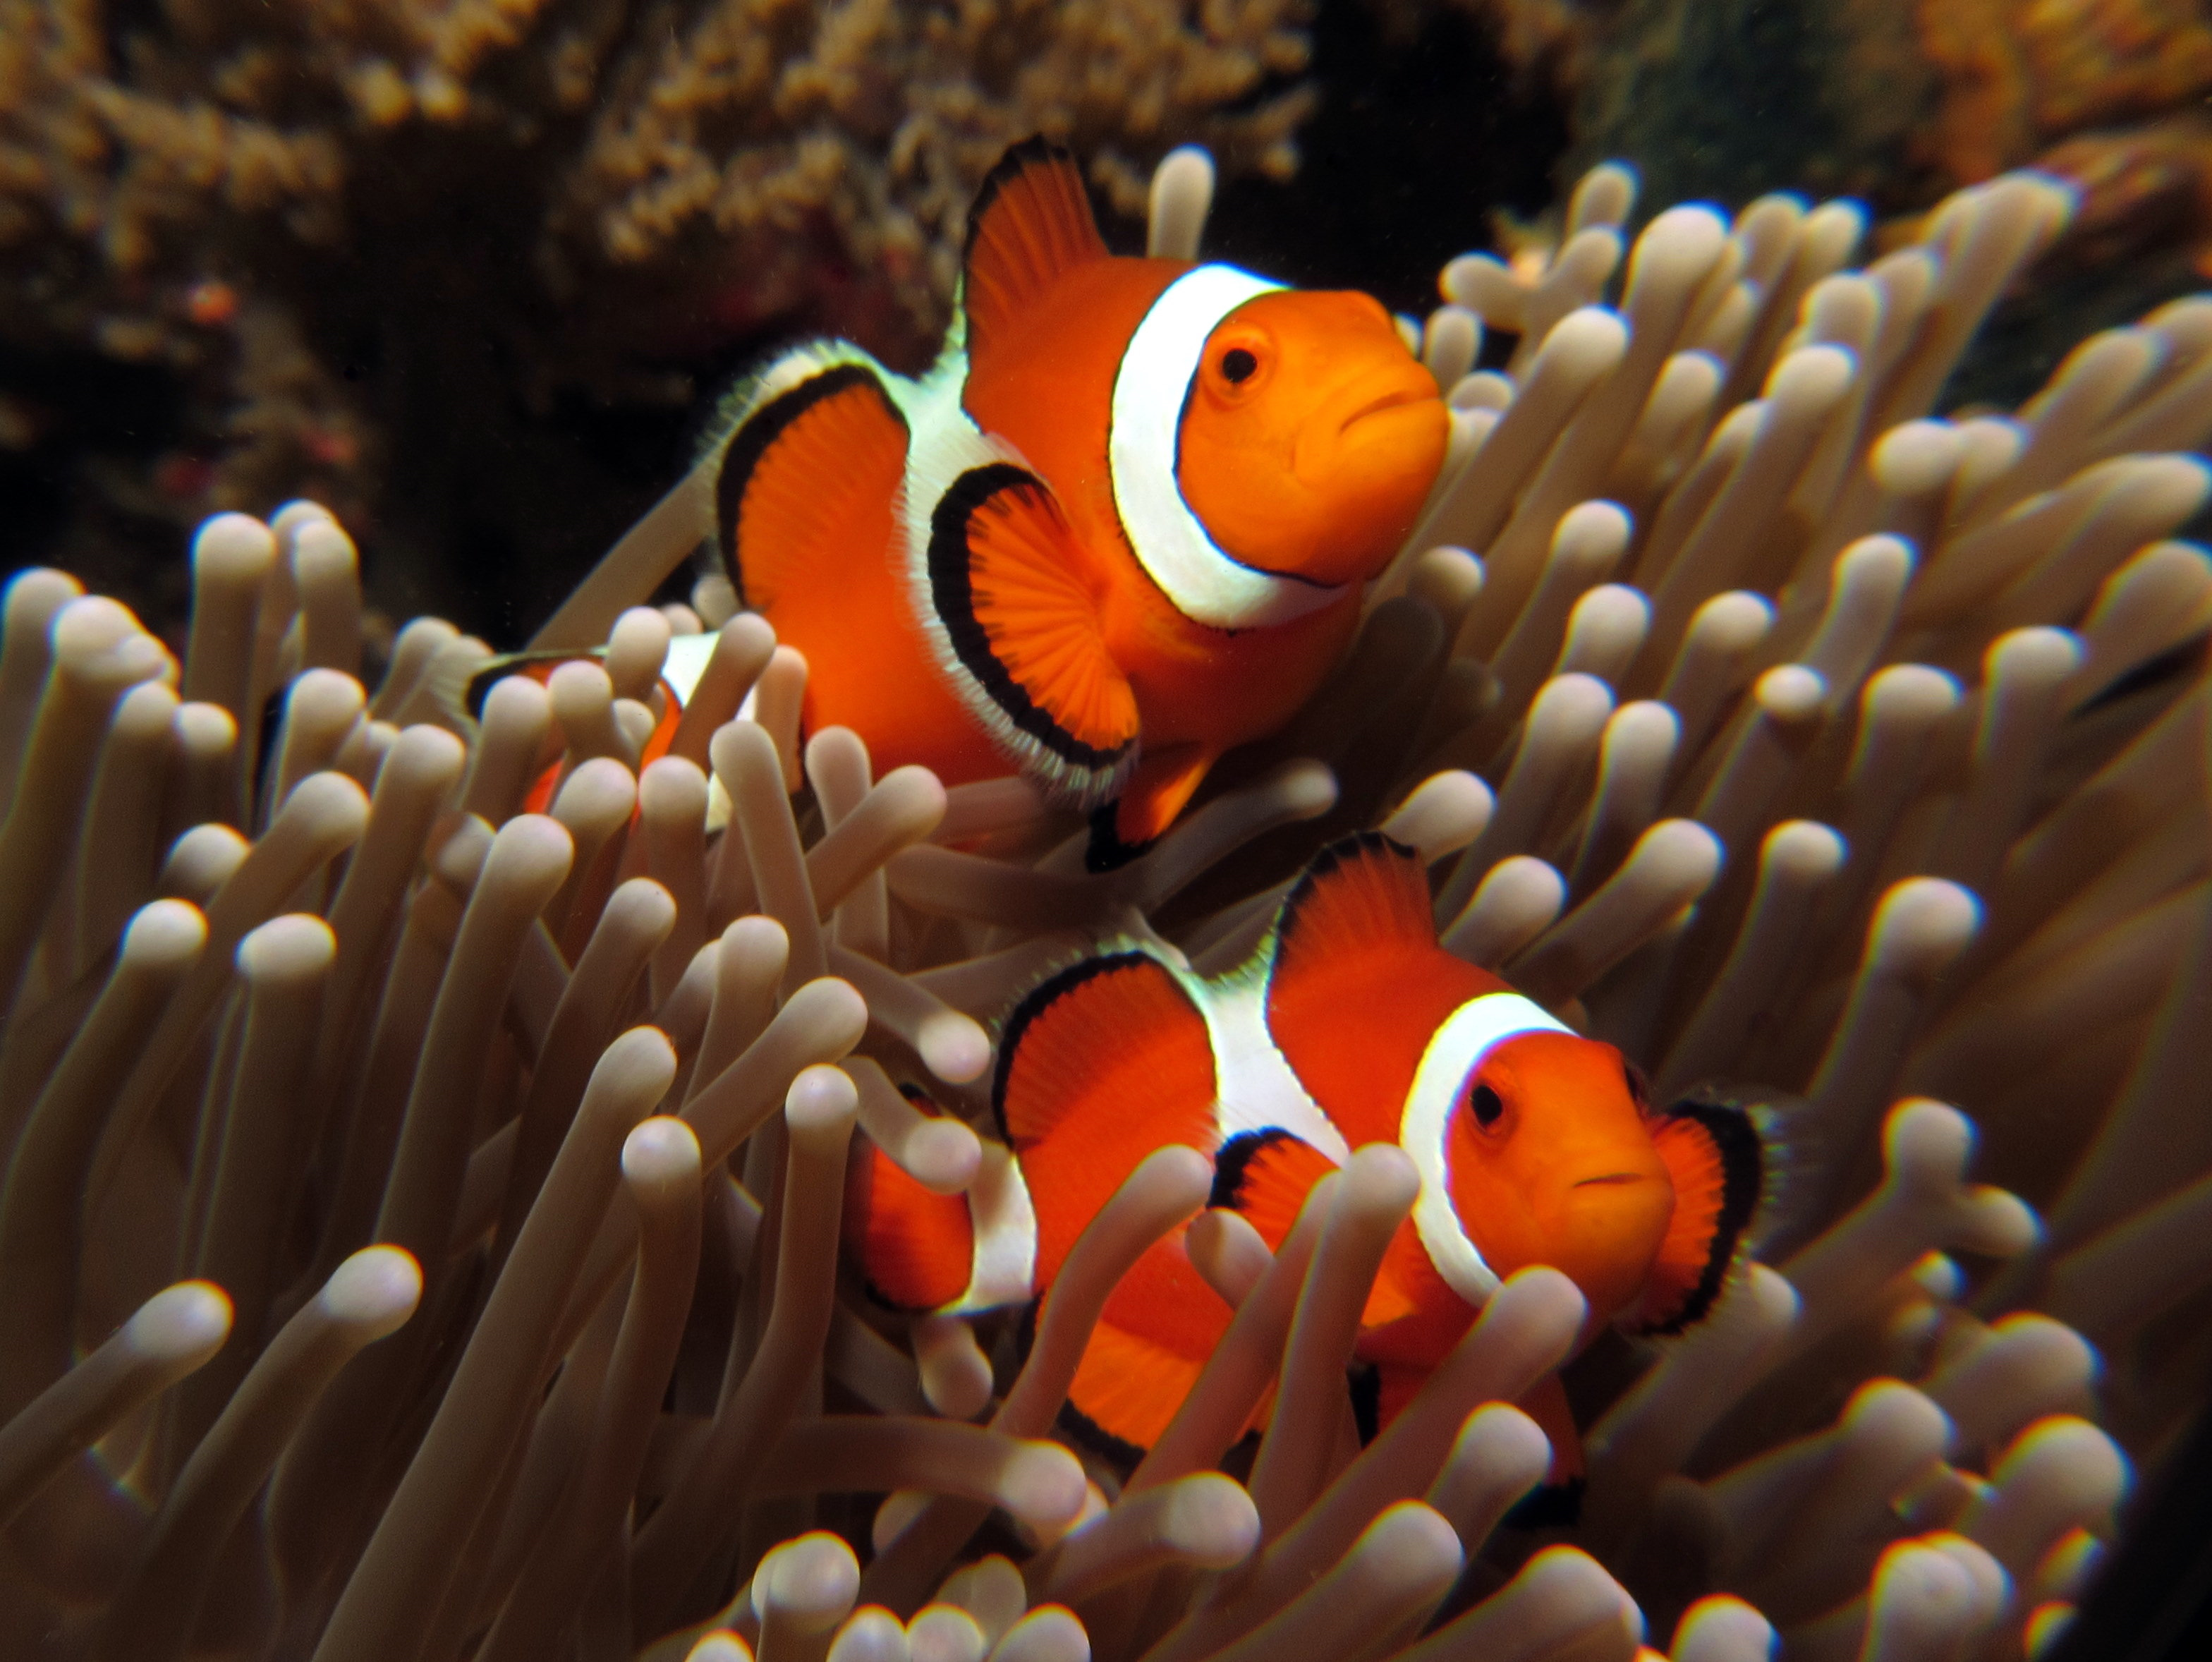 Under The Sea Wallpaper Hd Reference Clownfish 3dbose